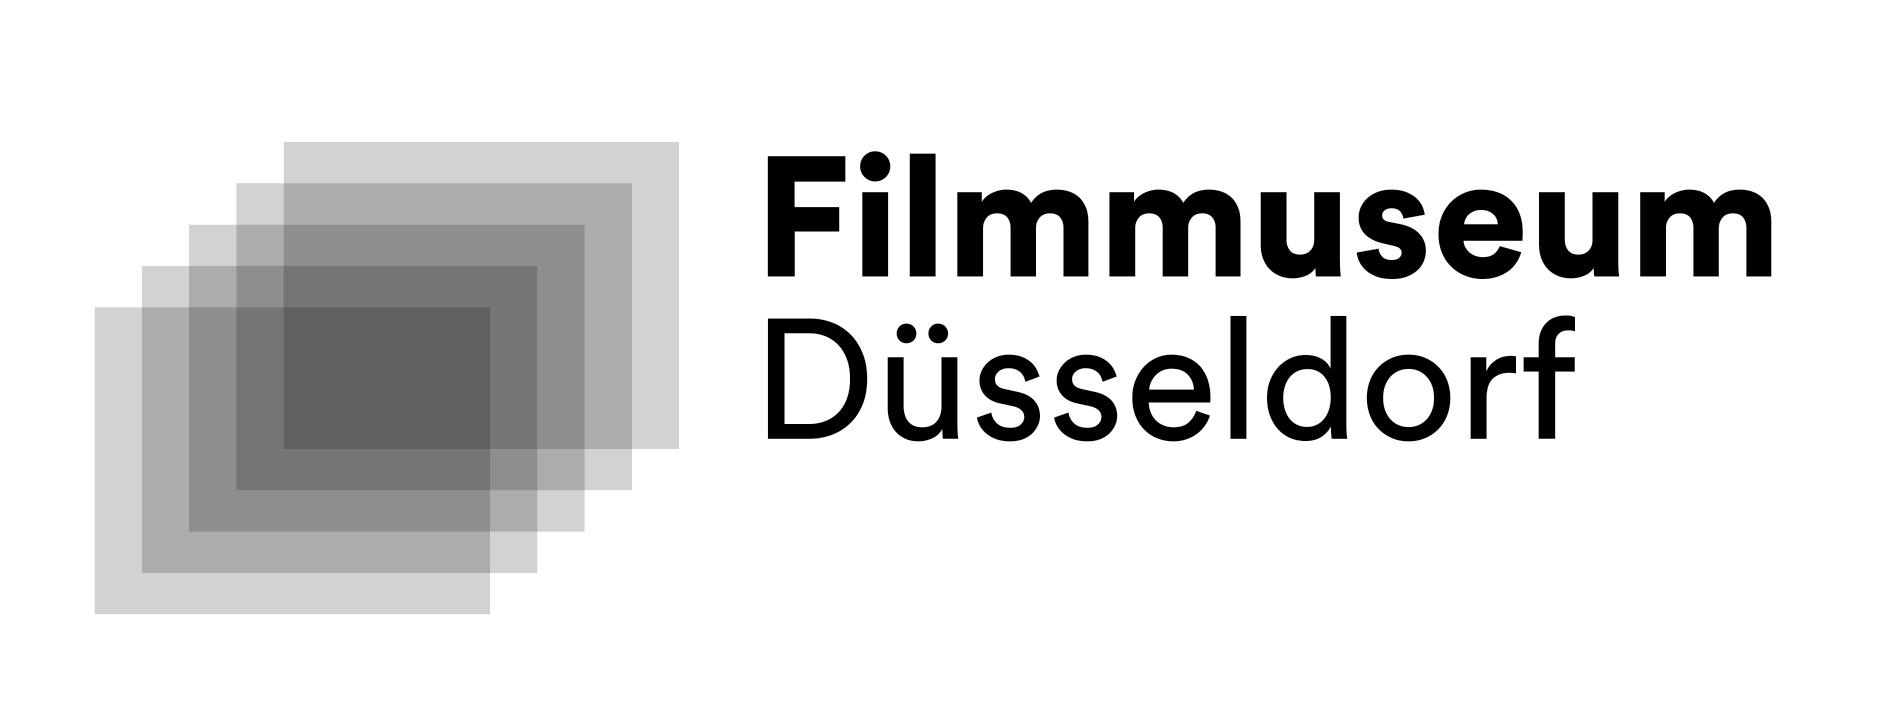 FilmmuseumDuesseldorf_Logo_2018_CMYK